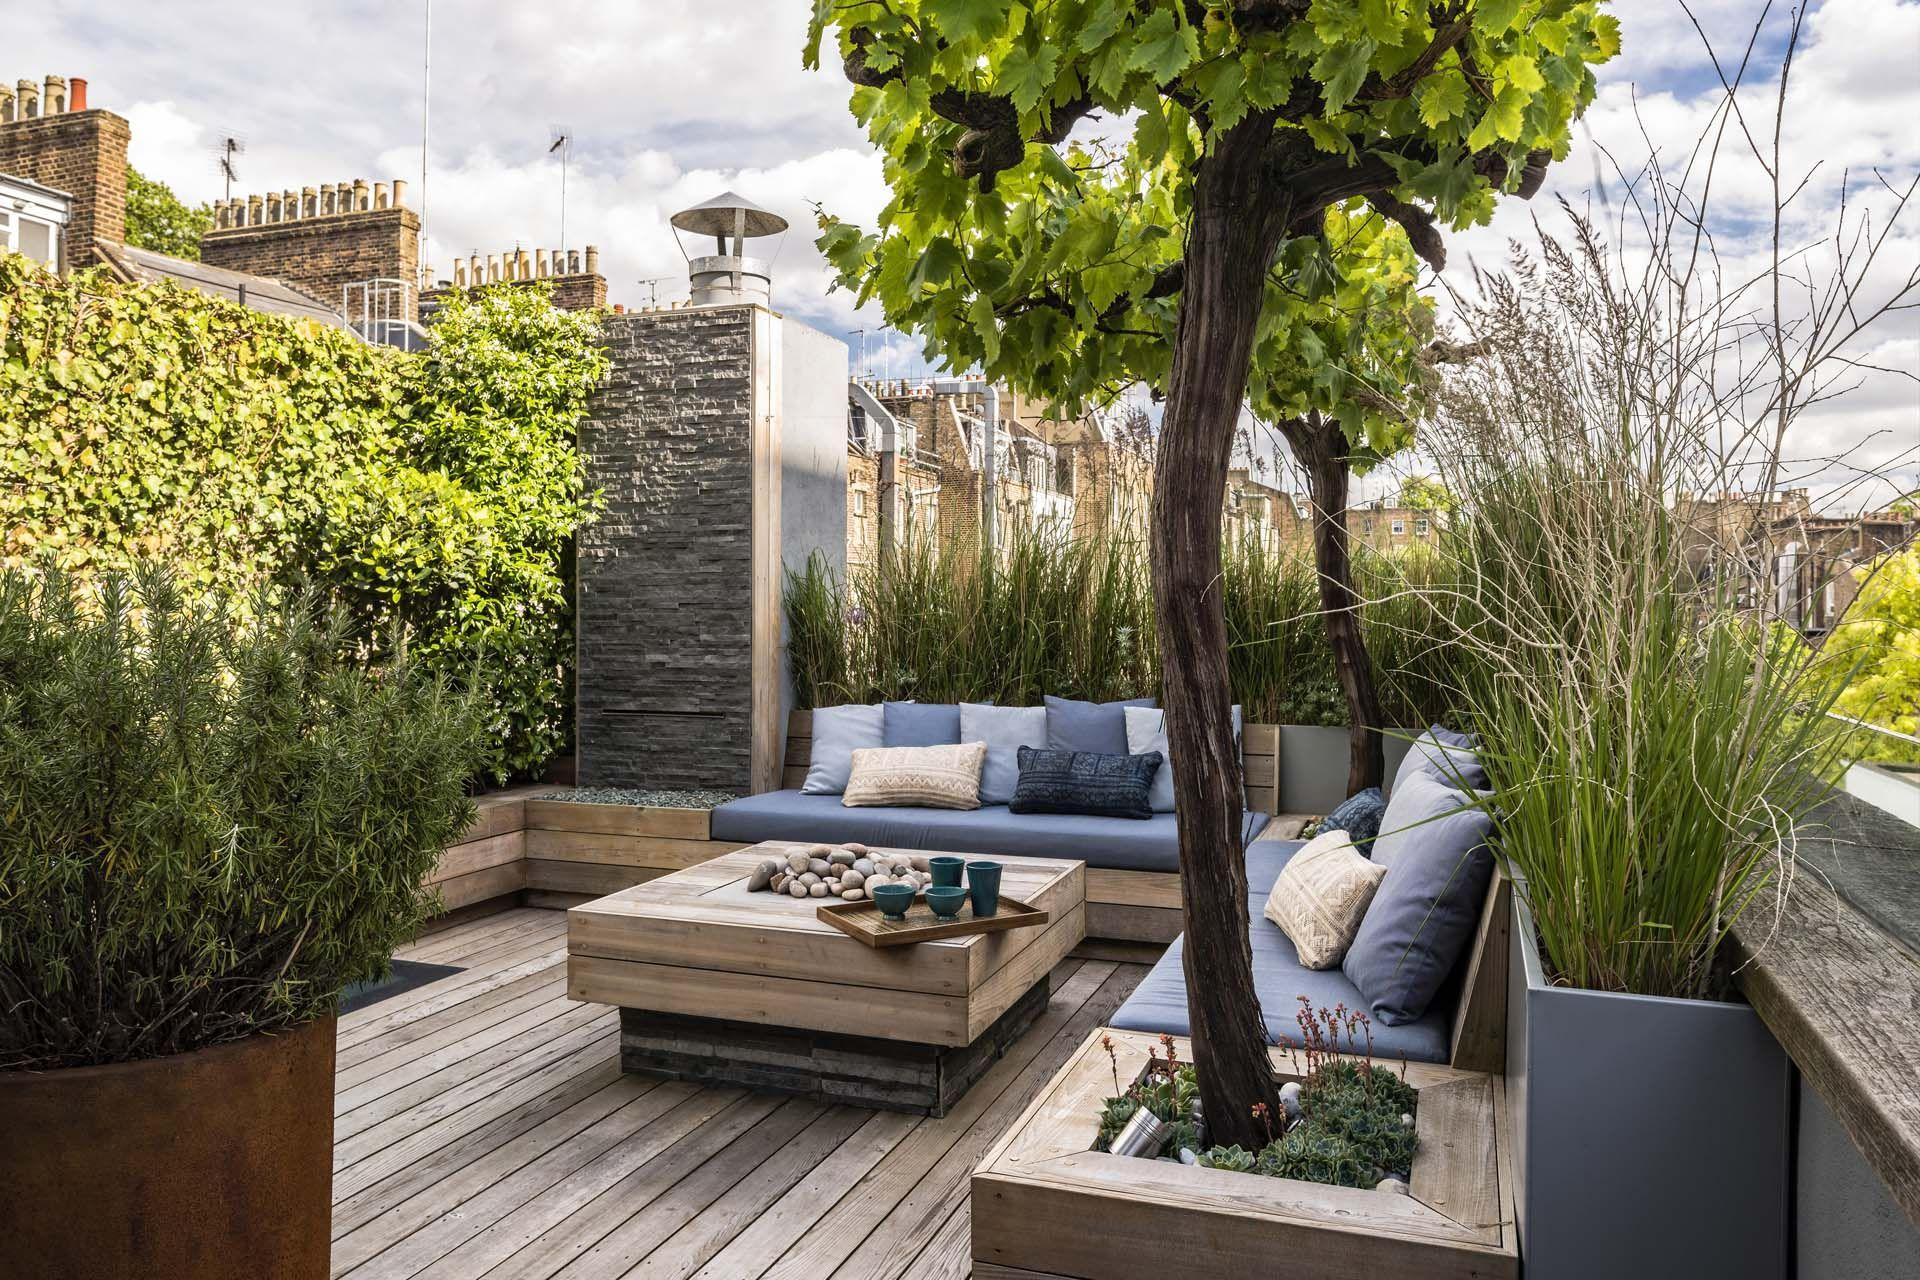 Garden Amp Landscape Design London By Adolfo Harrison Gardens Notting Hill Roof Garden Roof Garden Design Rooftop Terrace Design Rooftop Design